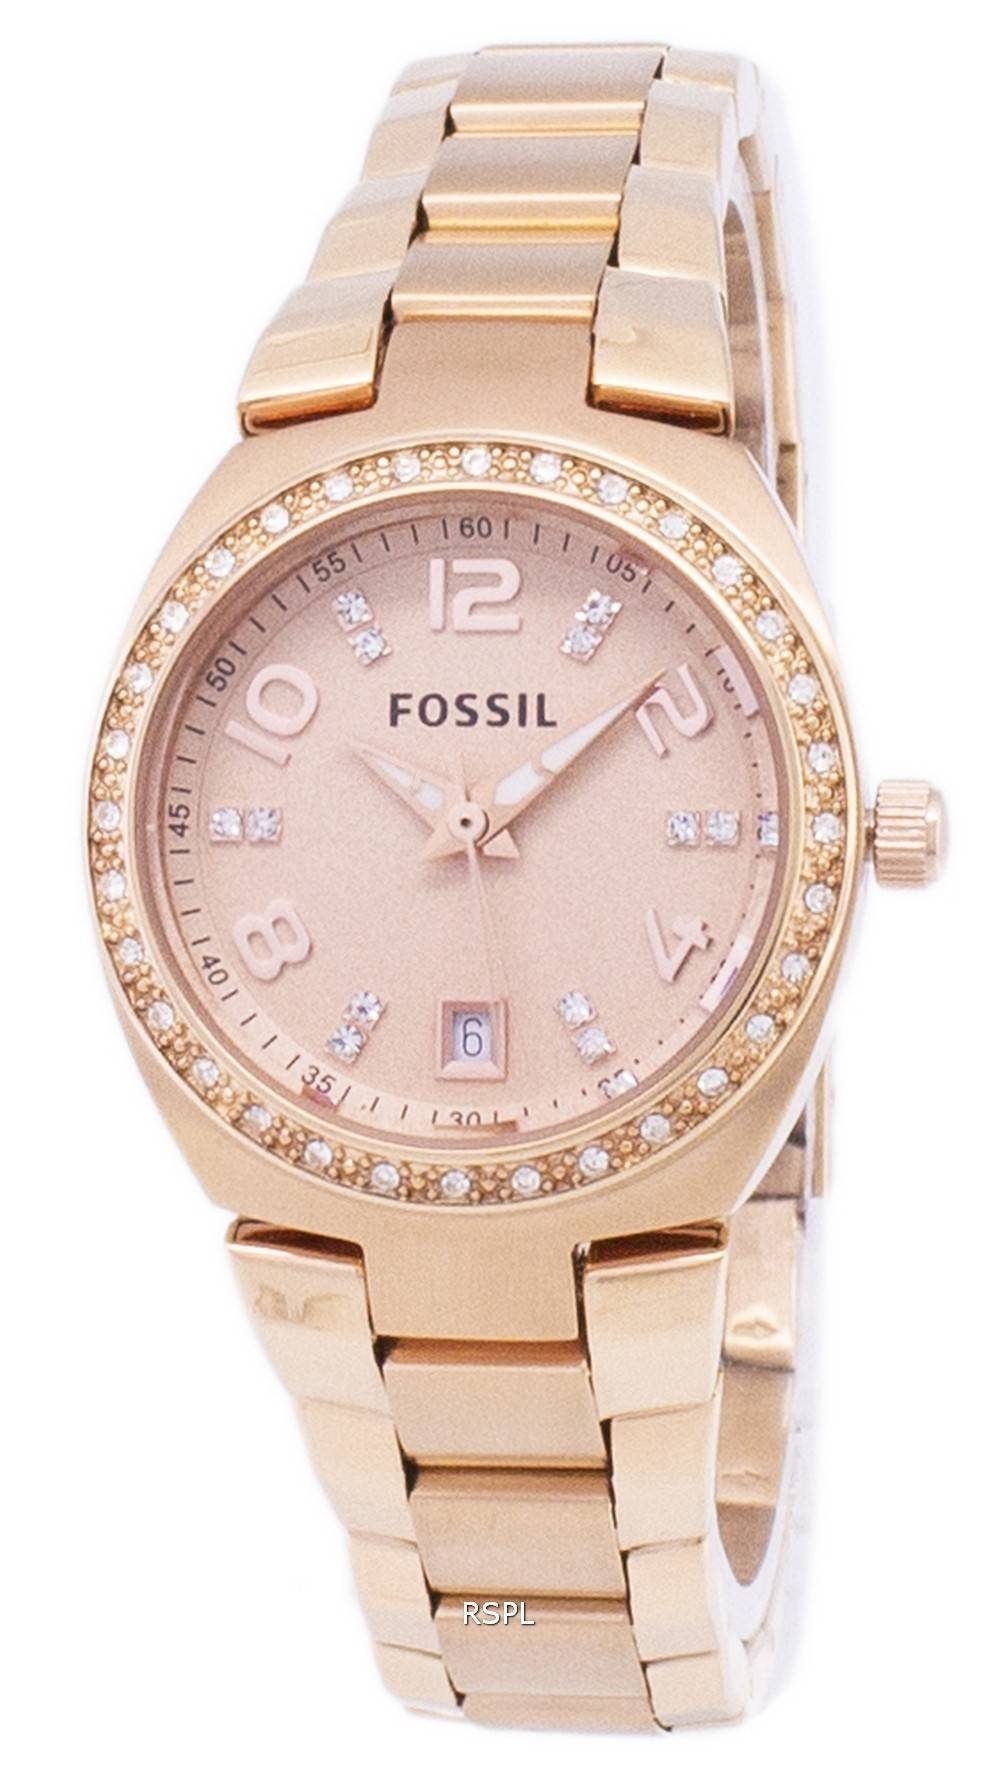 Fossil Cecile Multifunction Stainless Steel Watch Am 4509 Daftar Am4632 Jam Tangan Wanita Original Serena Crystals Rose Gold Tone Am4508 Womens